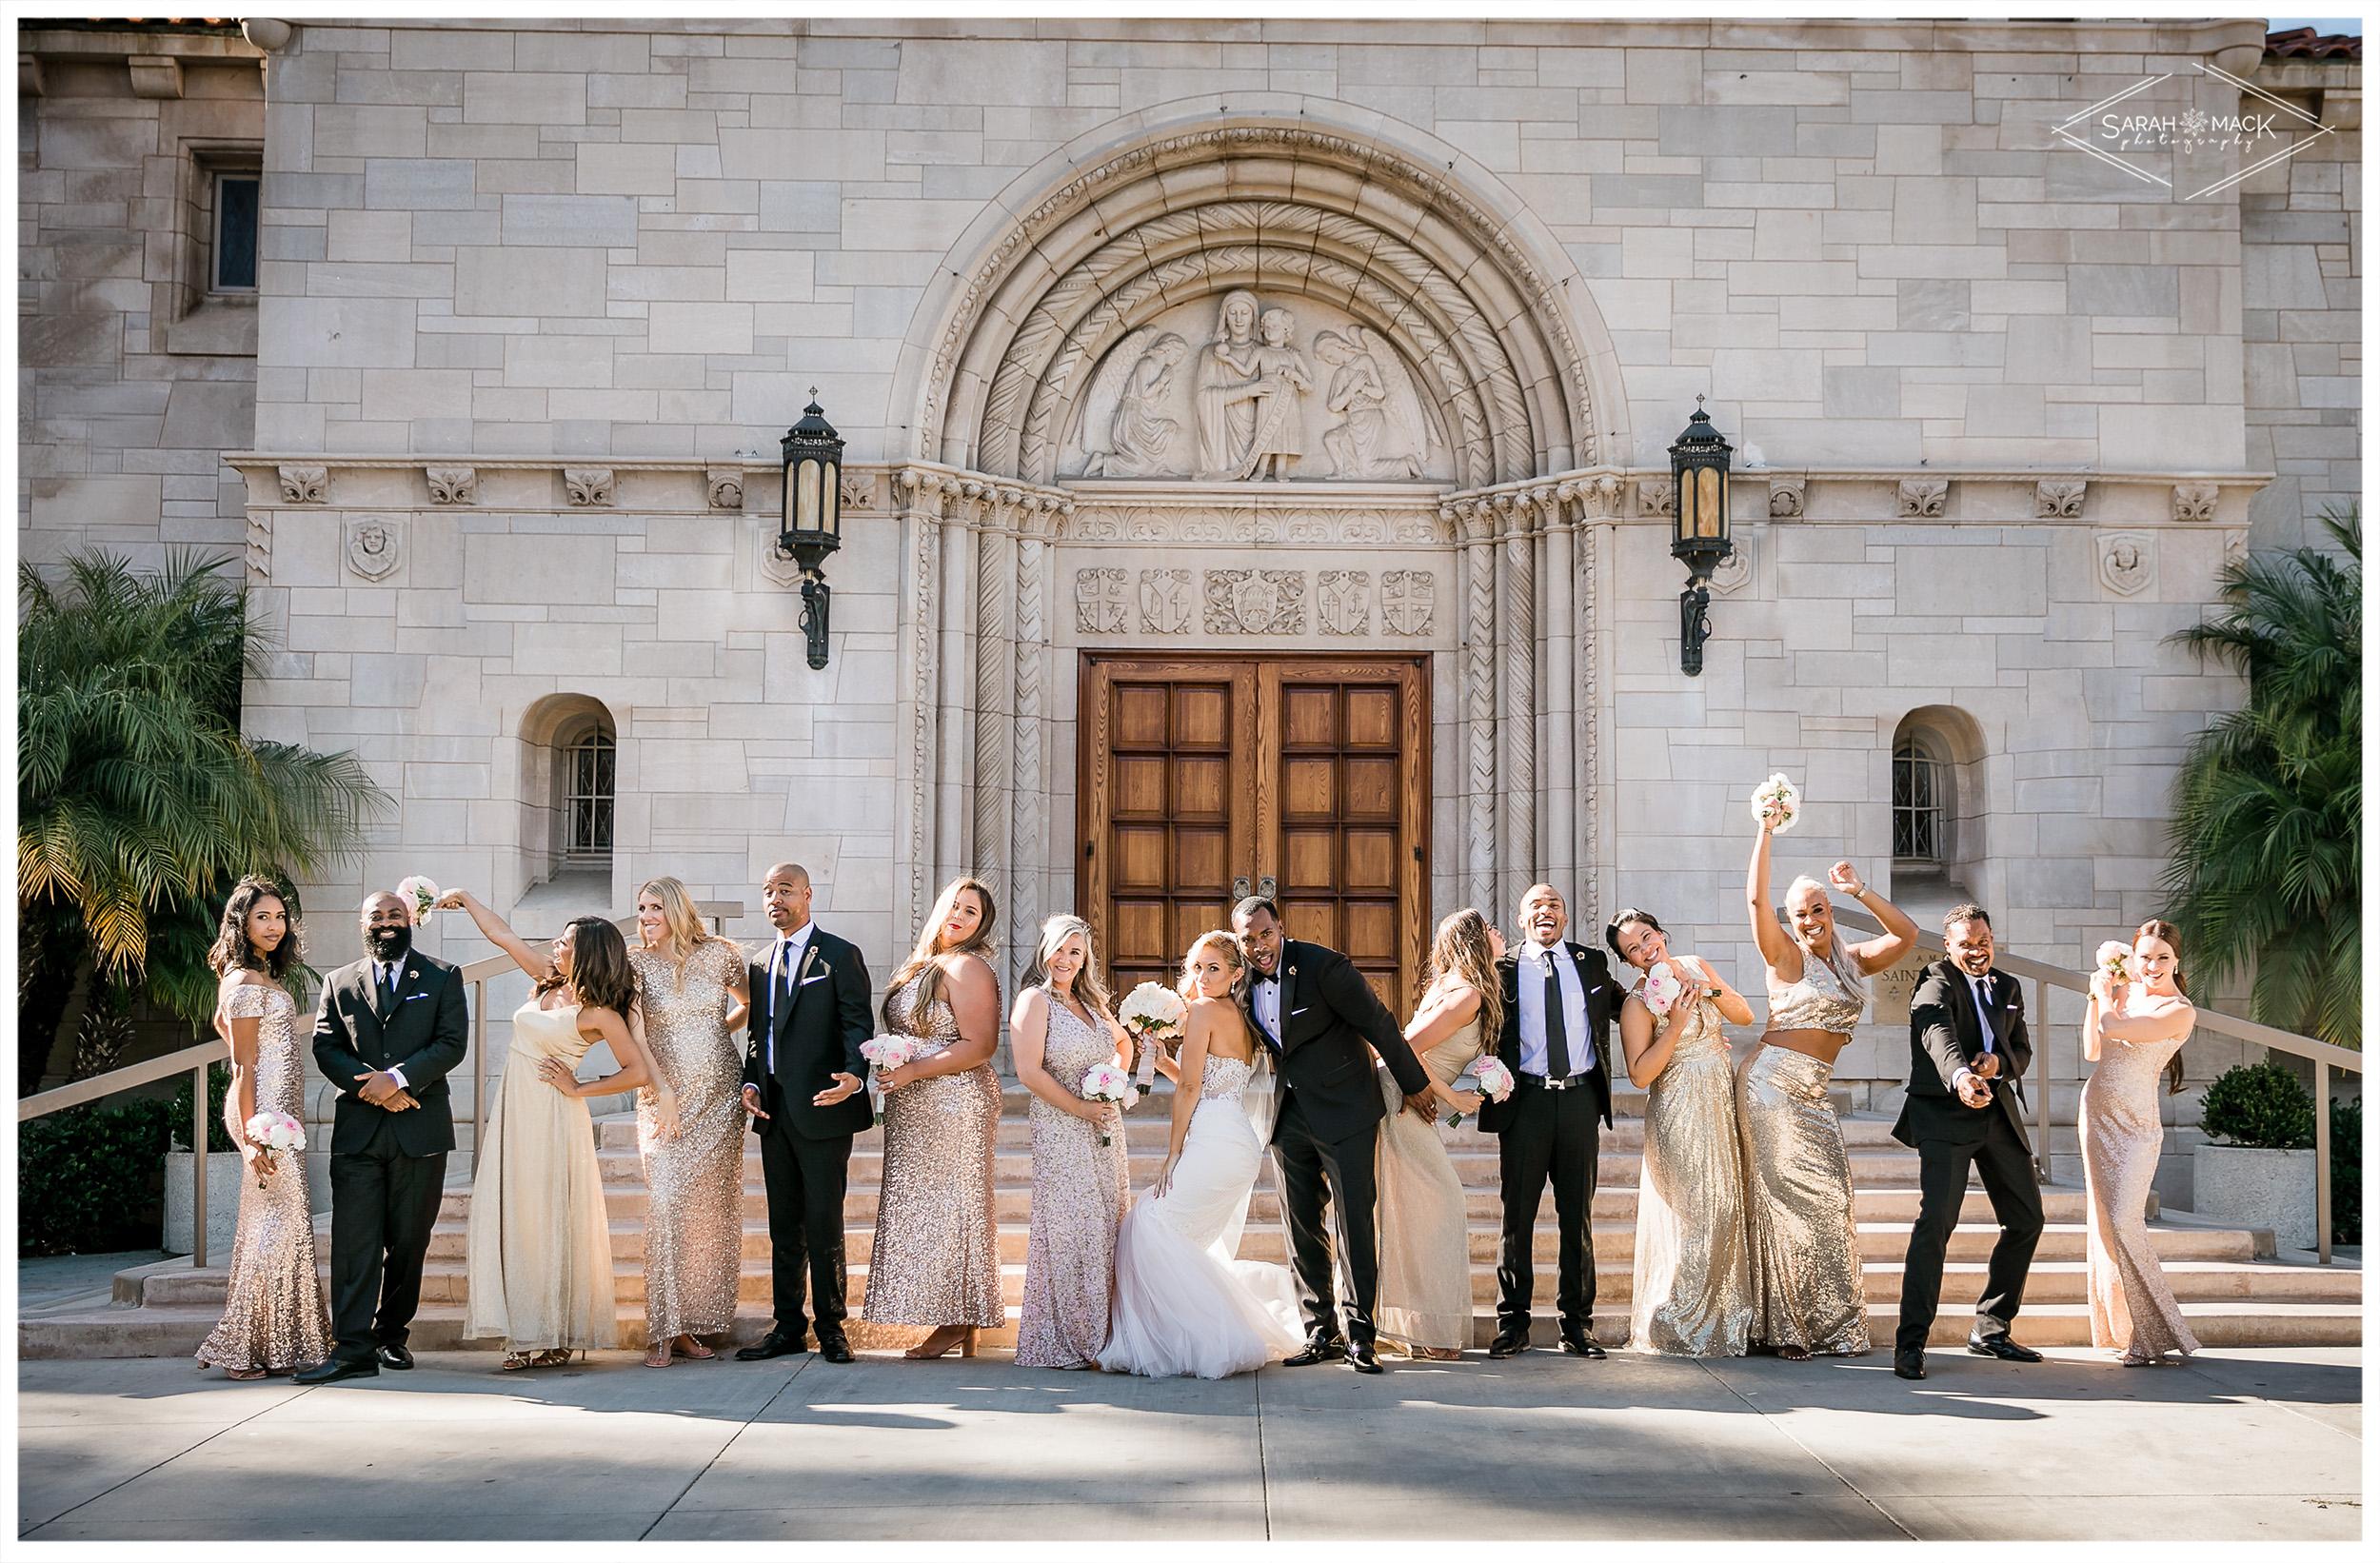 MK-Santa-Monica-Catholic-Church-Wedding-Photography-35.jpg